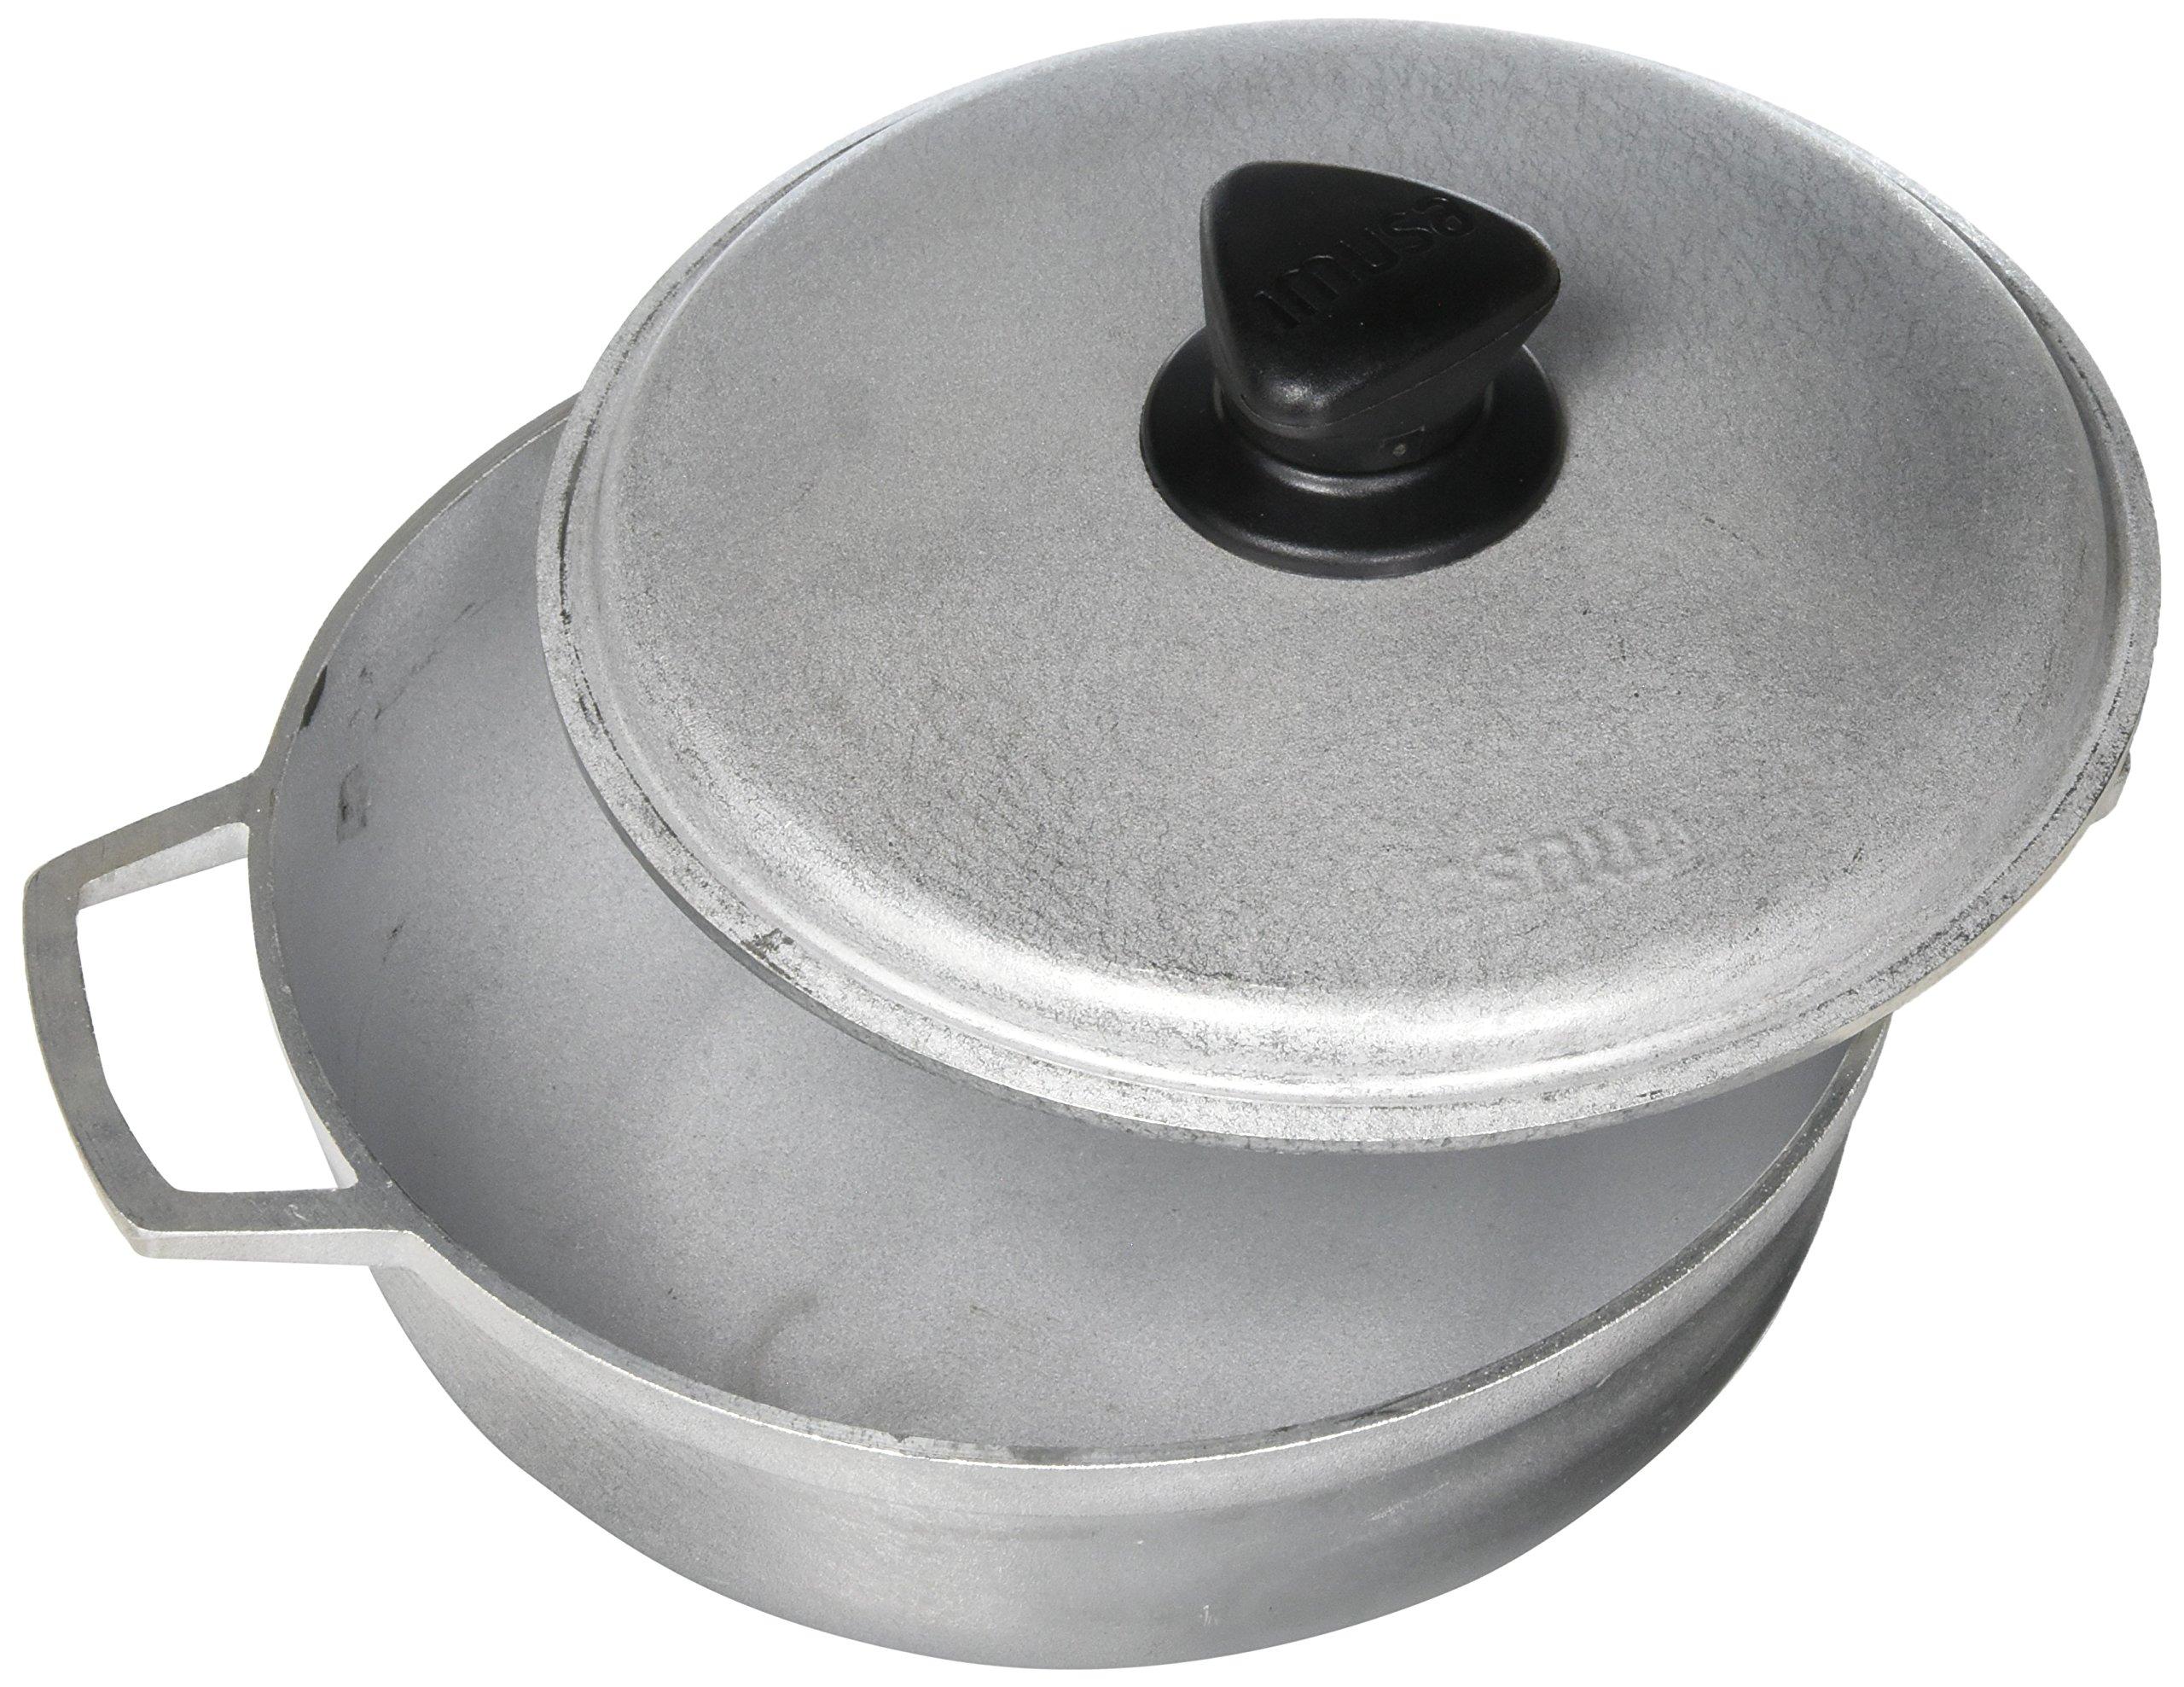 IMUSA USA GAU-80503 Traditional Aluminum Colombian Natural Caldero 12.6-Quart, Silver